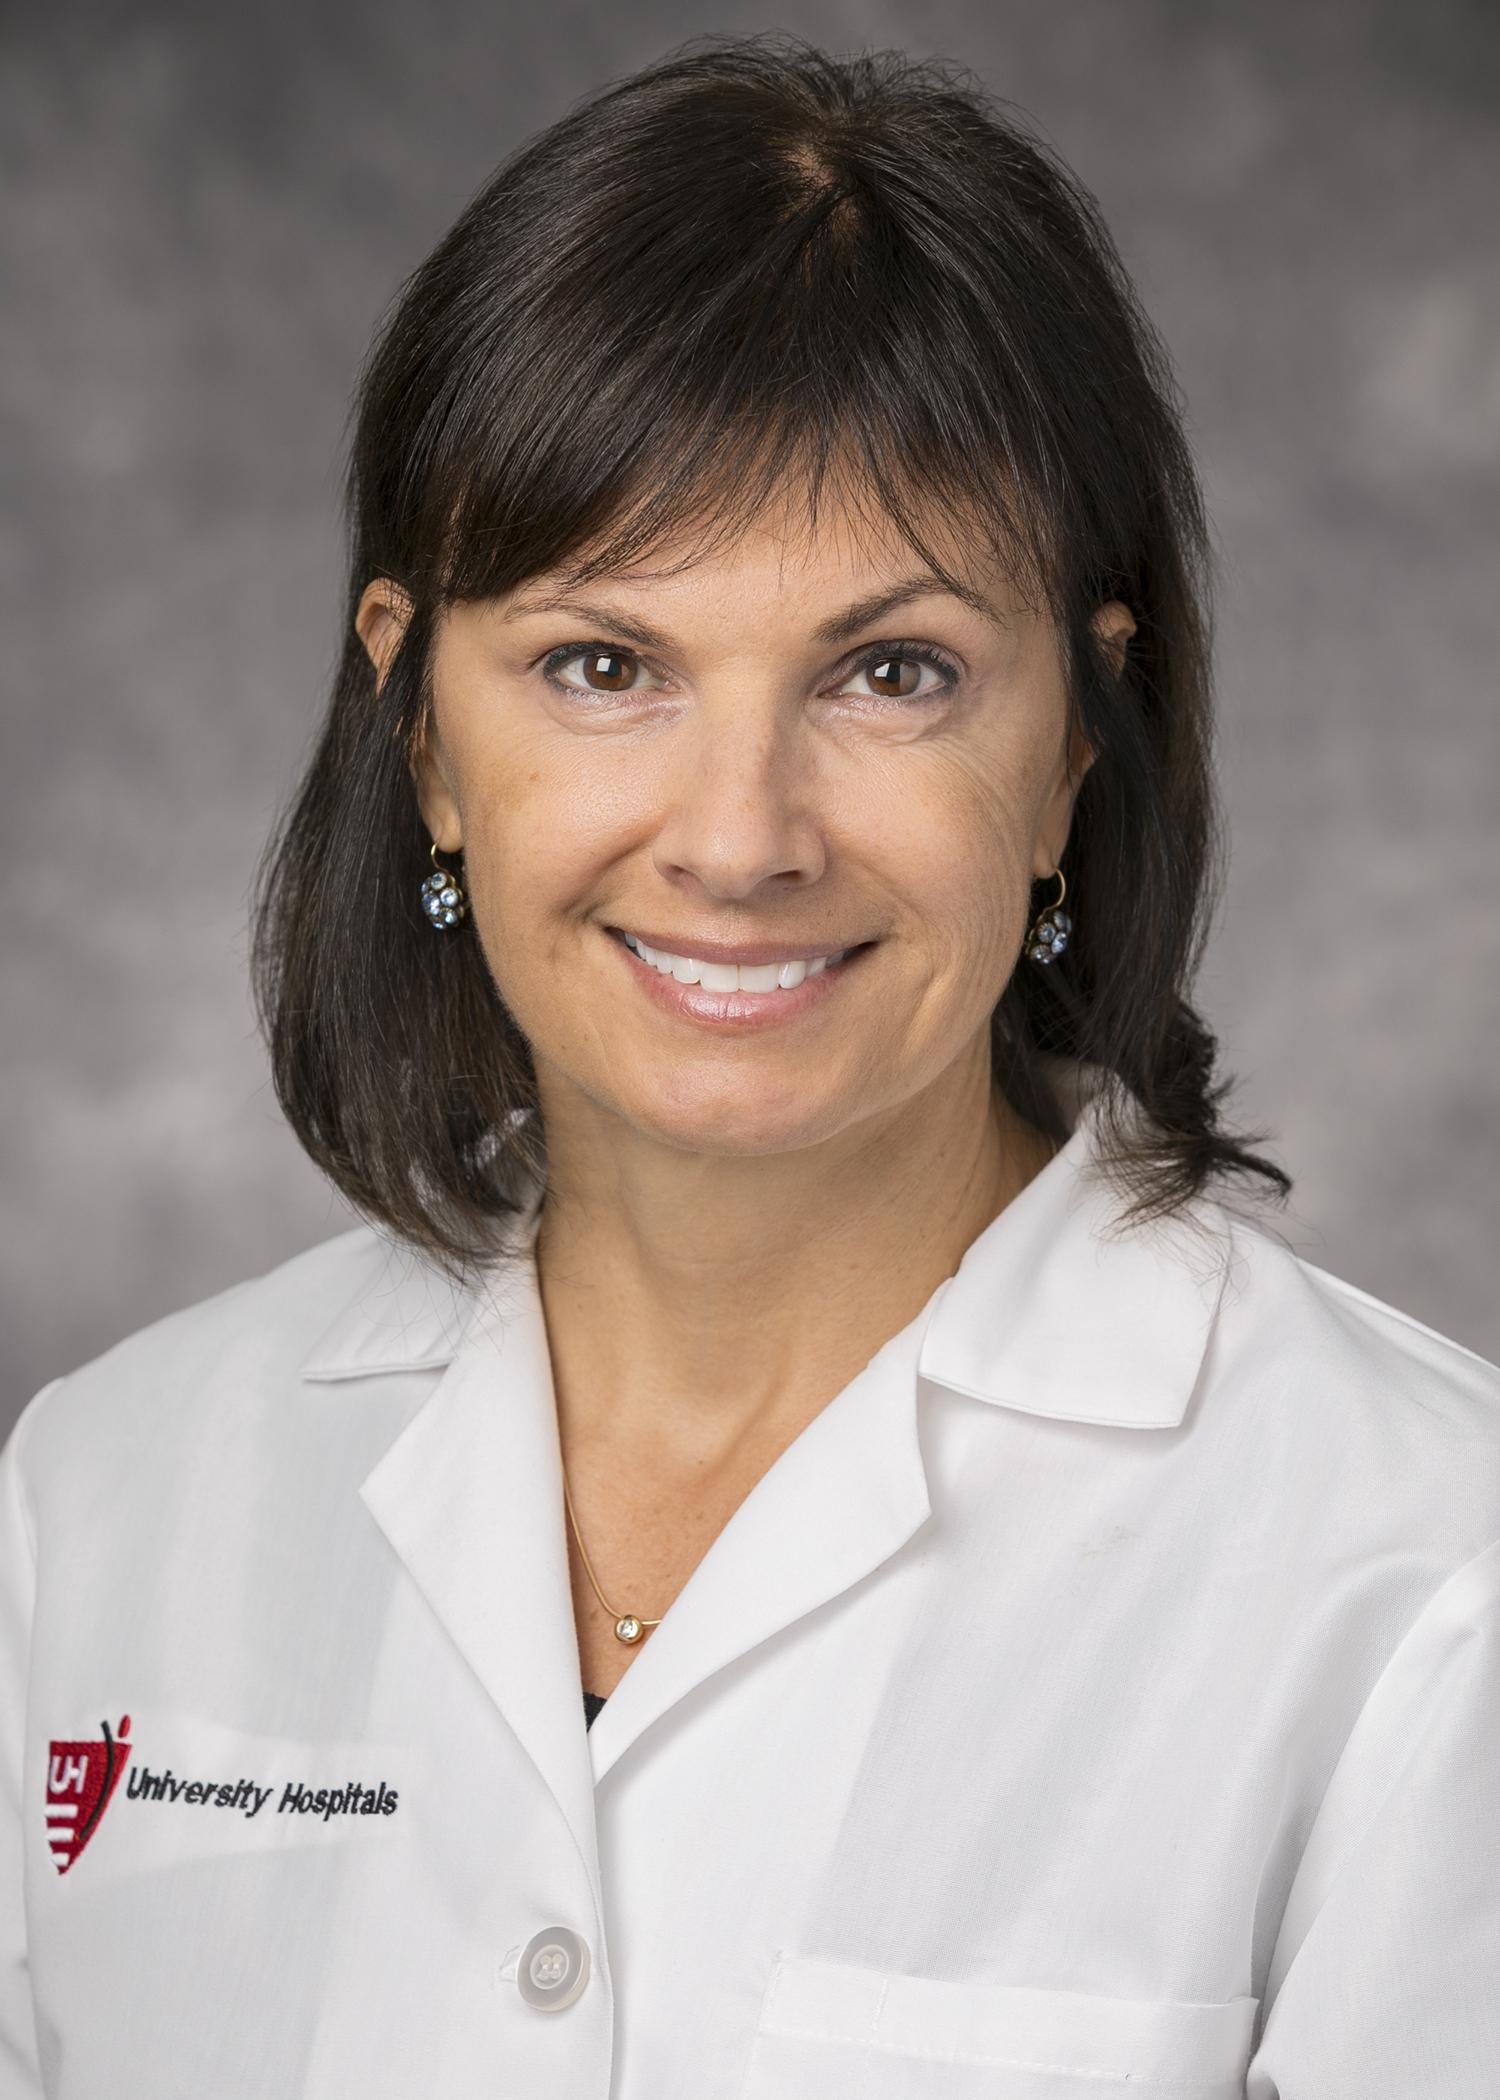 Nicole C. Maronian, MD